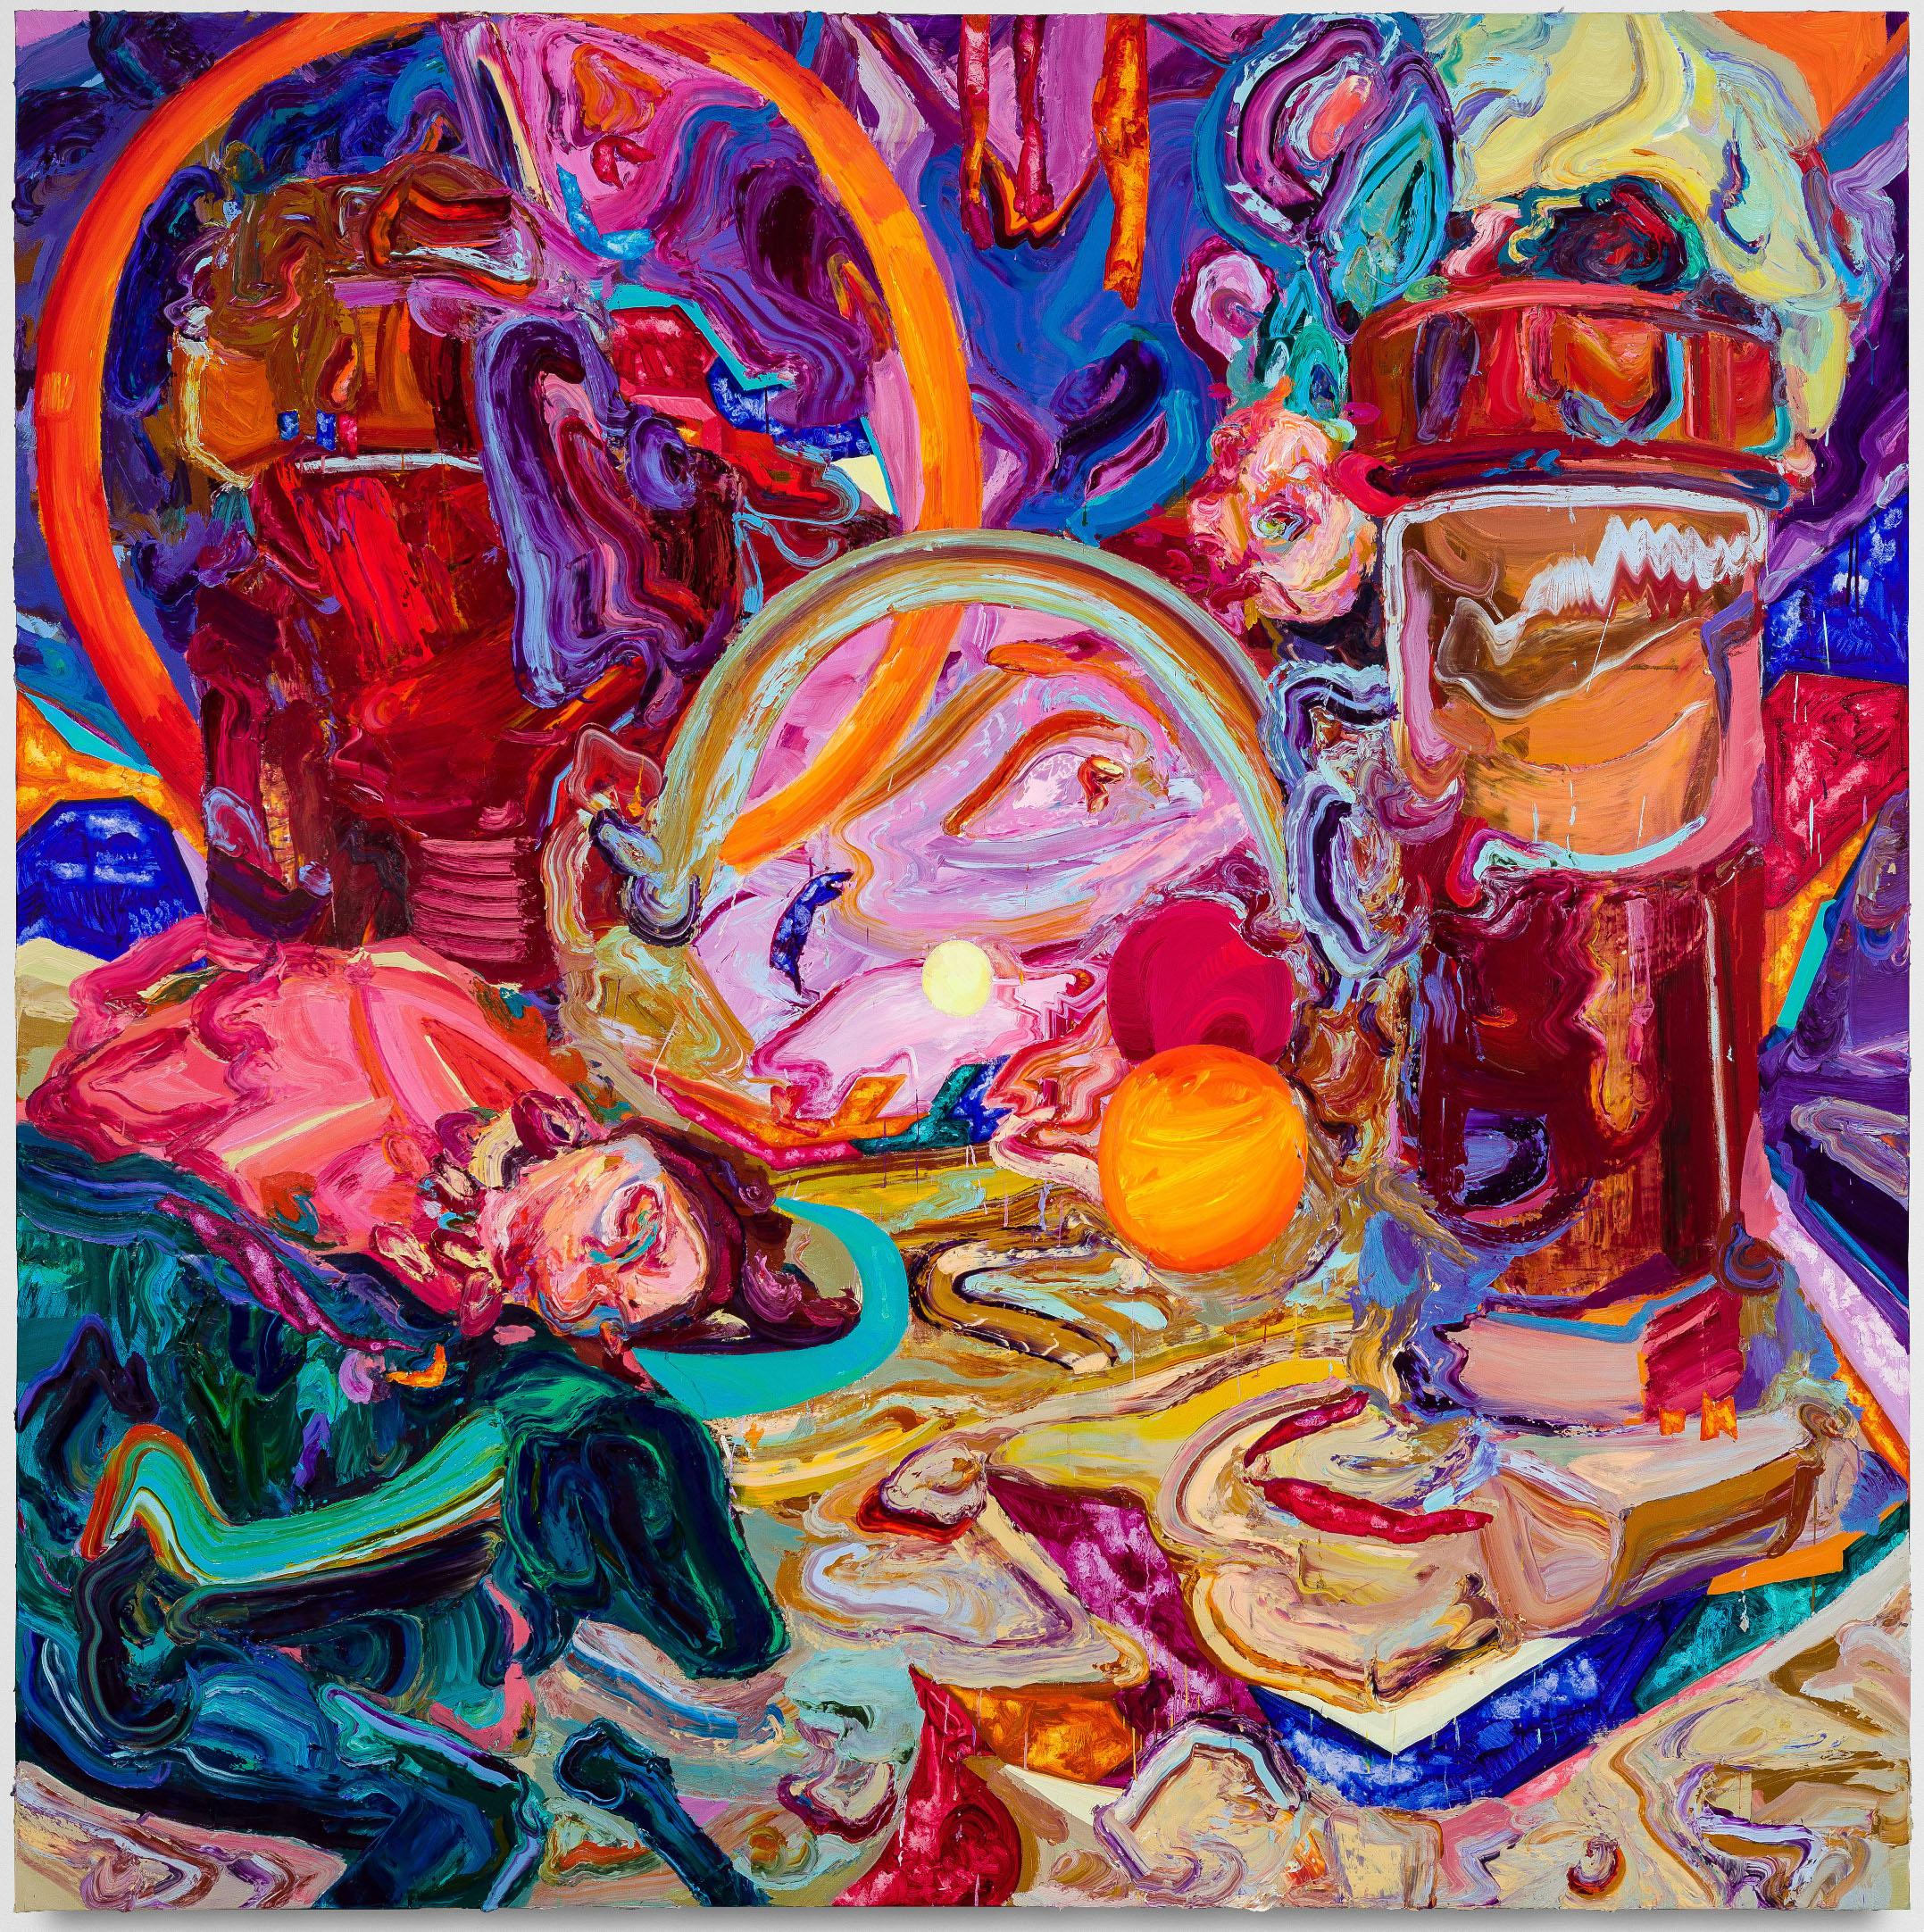 Miryam Haddad, La Proie Du Soleil